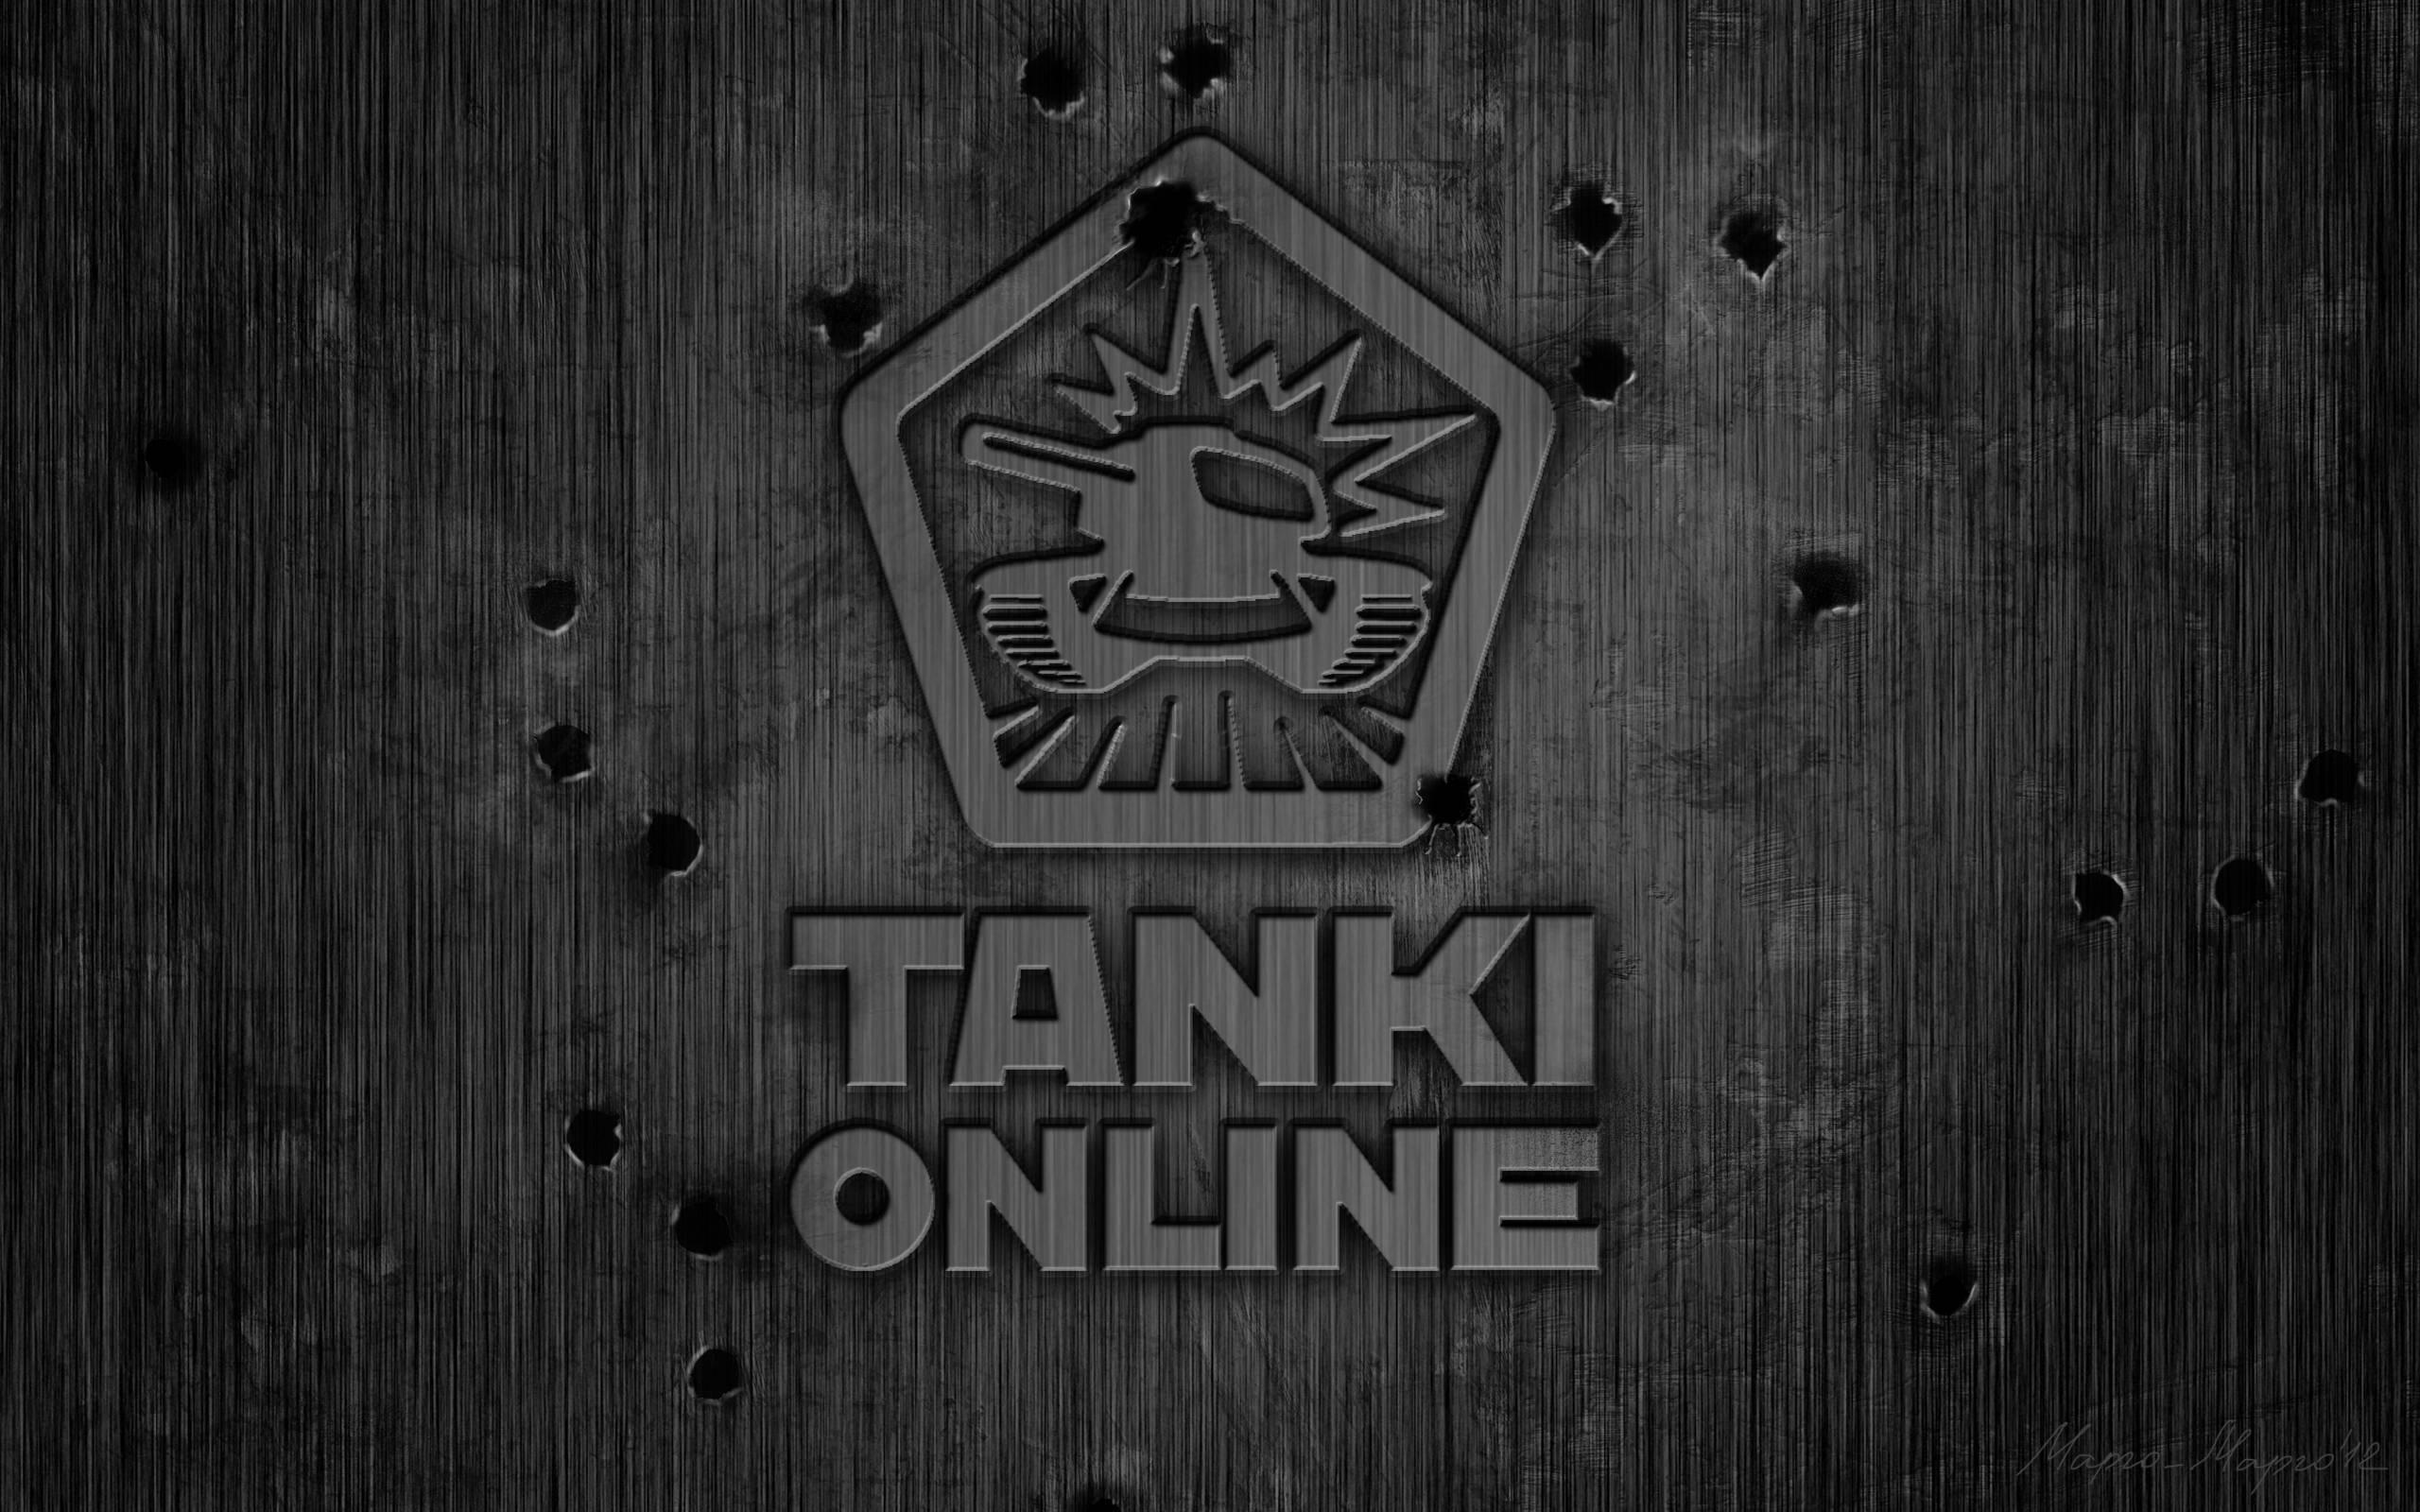 free wallpaper day 5 tanki online free mmo game